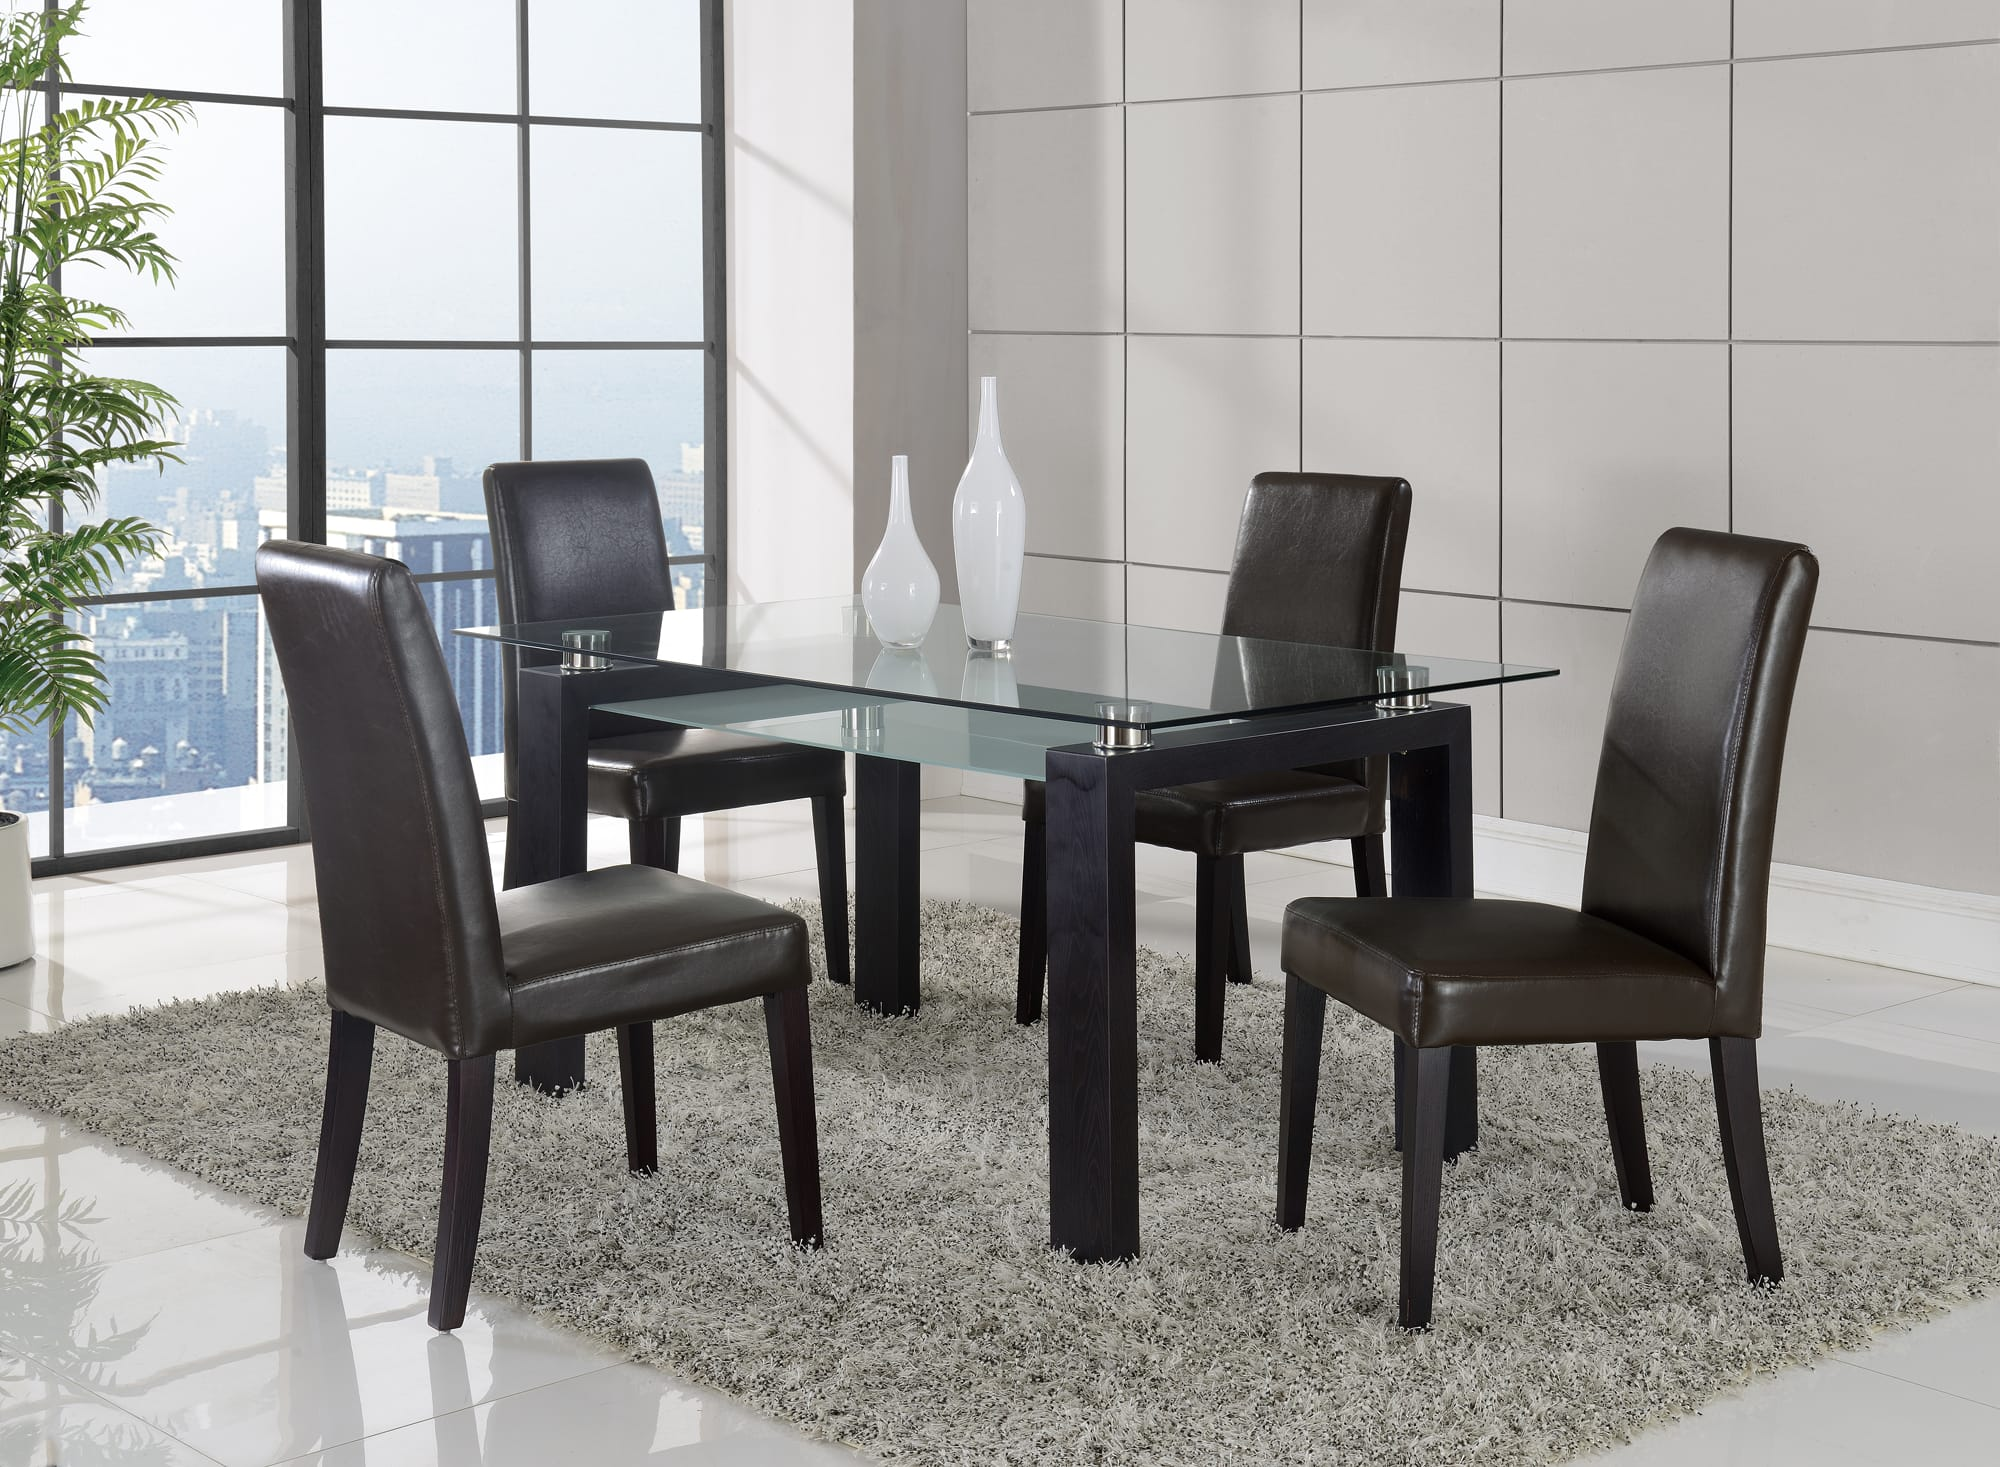 black walnut kitchen table modern undermount sink dining d646dt by global furniture